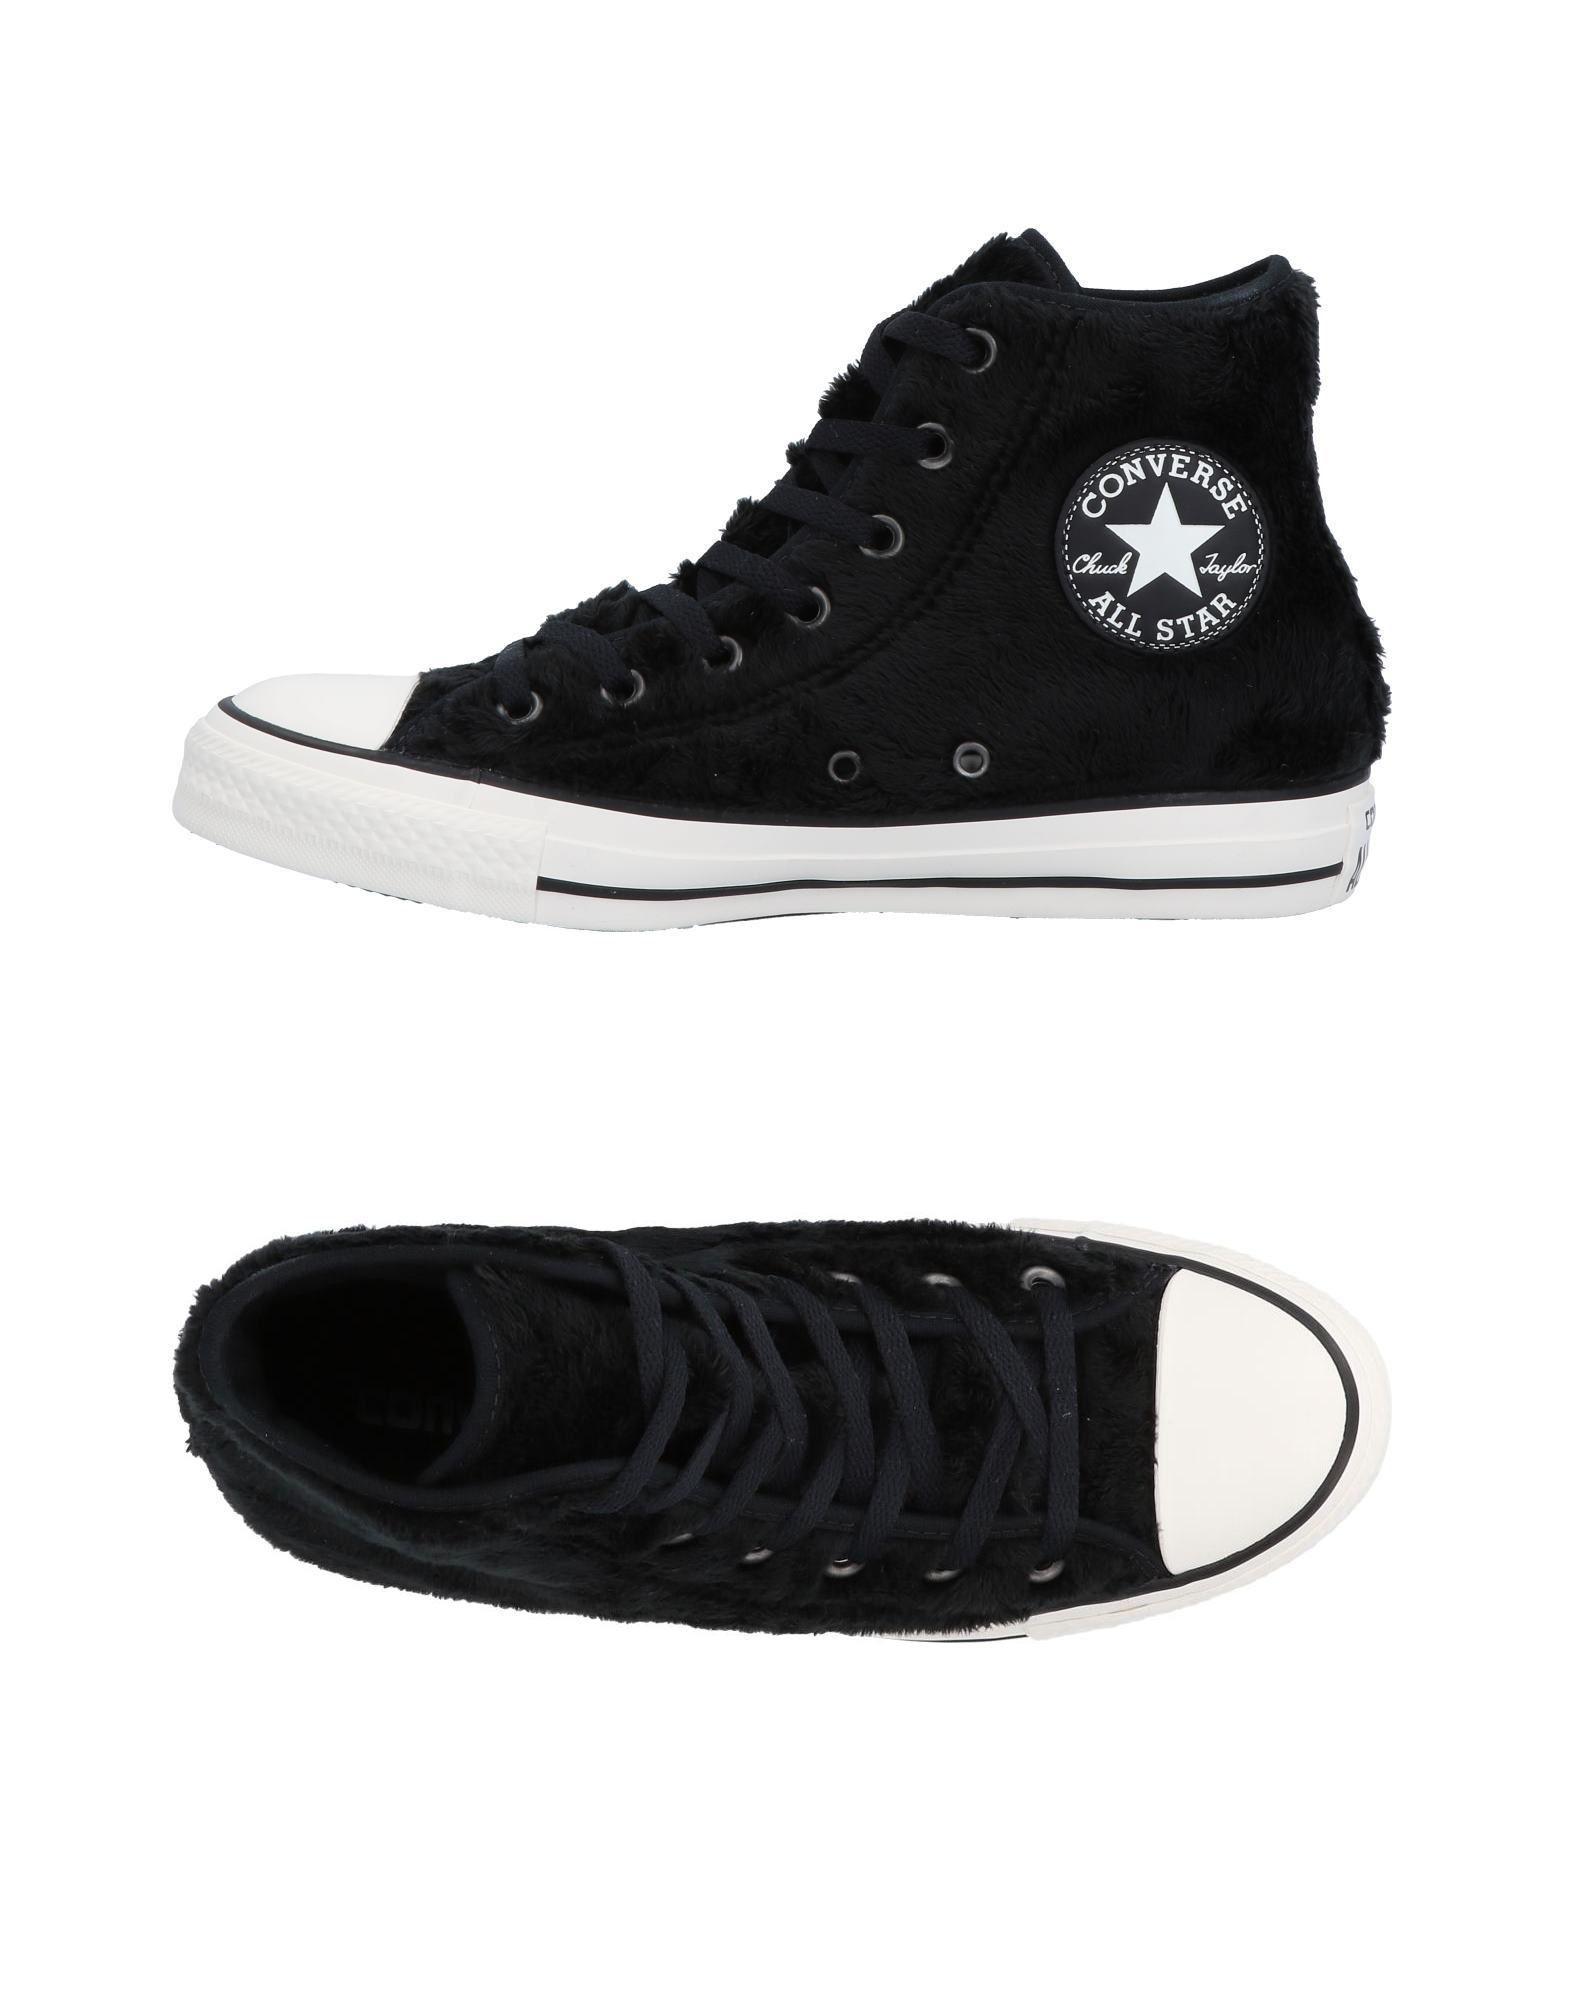 1ca2ea9e0f4 Converse High-tops   Sneakers in Black - Lyst